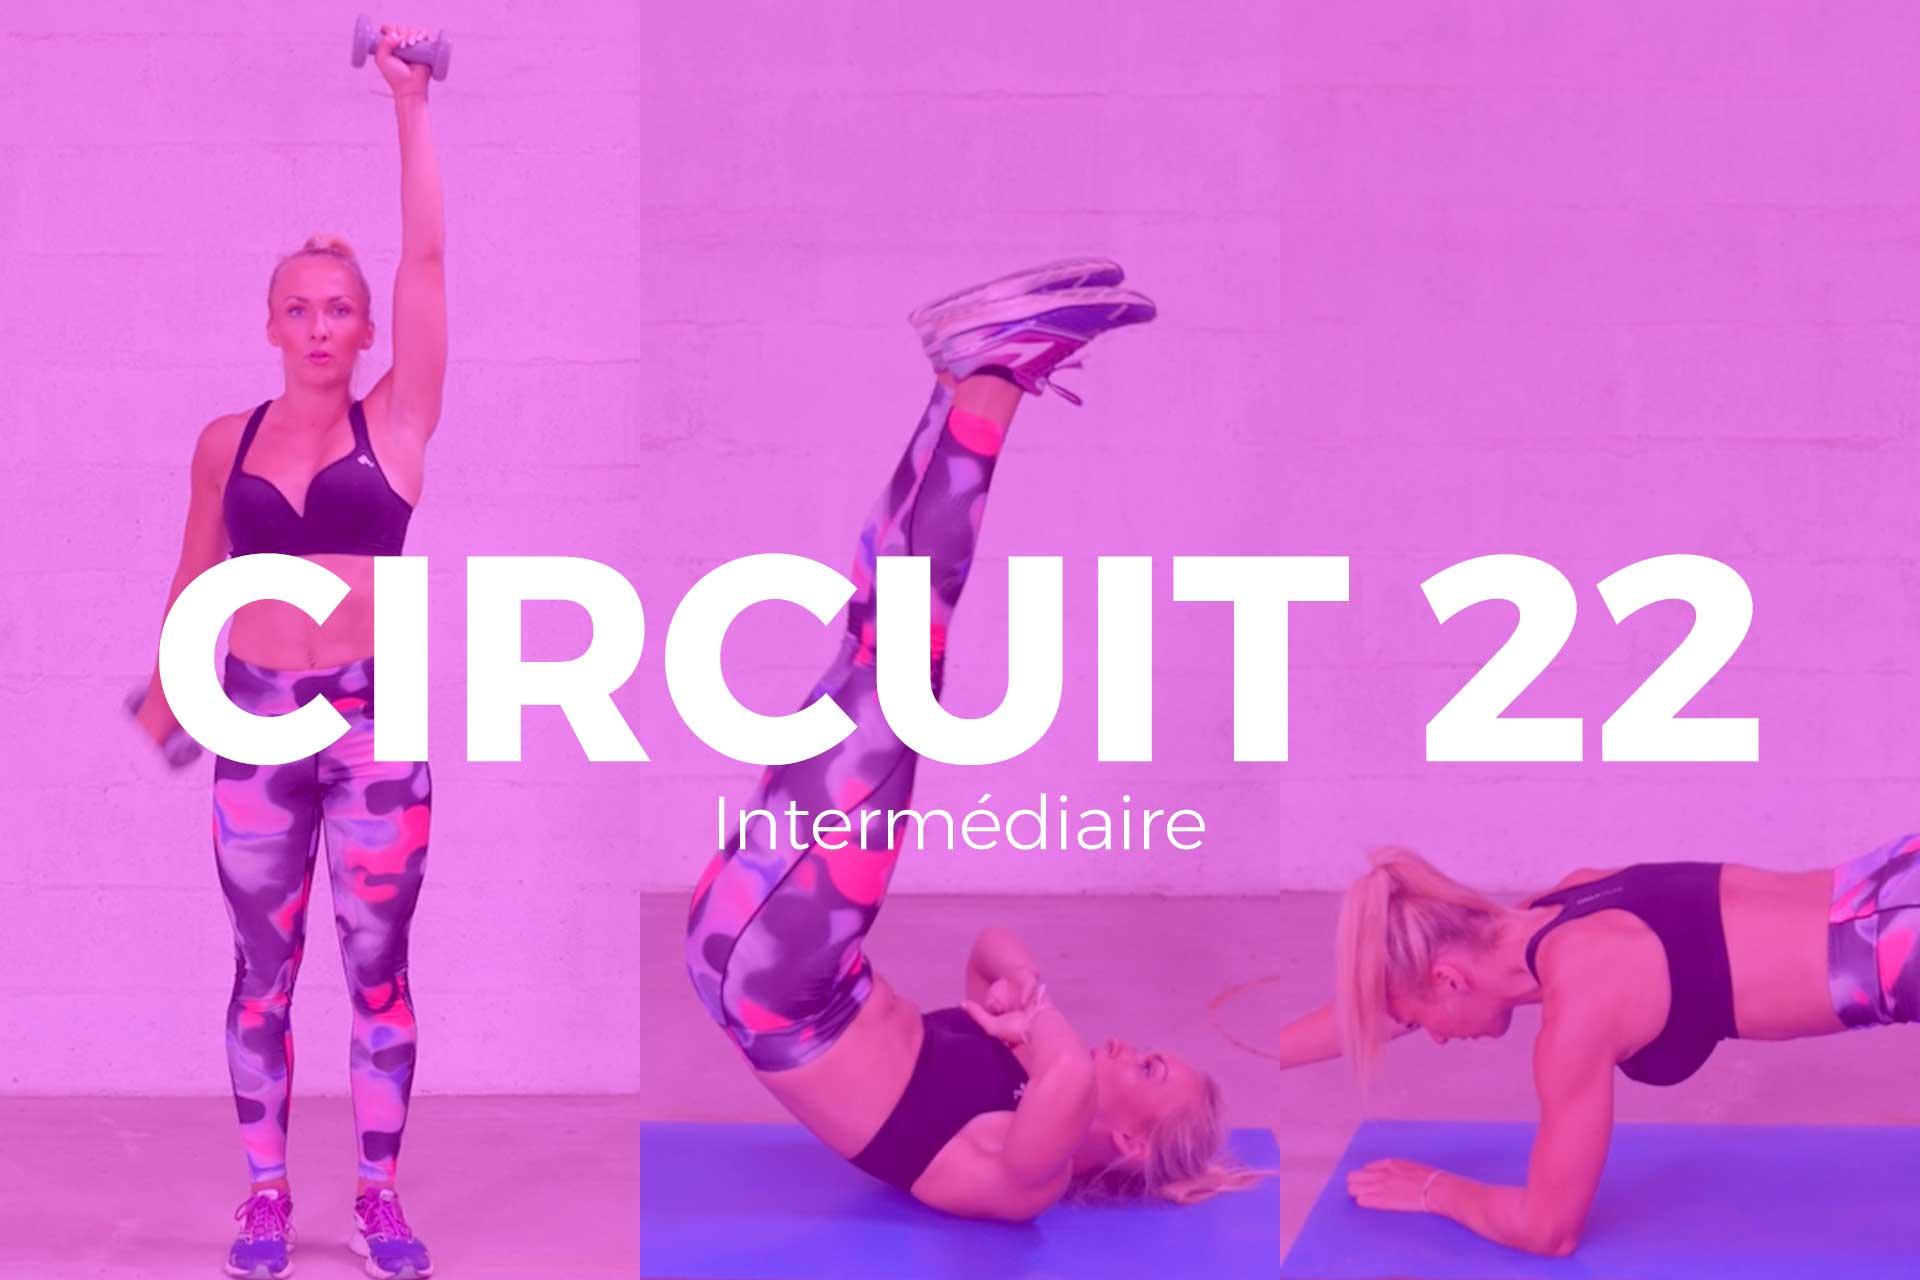 circuit 22